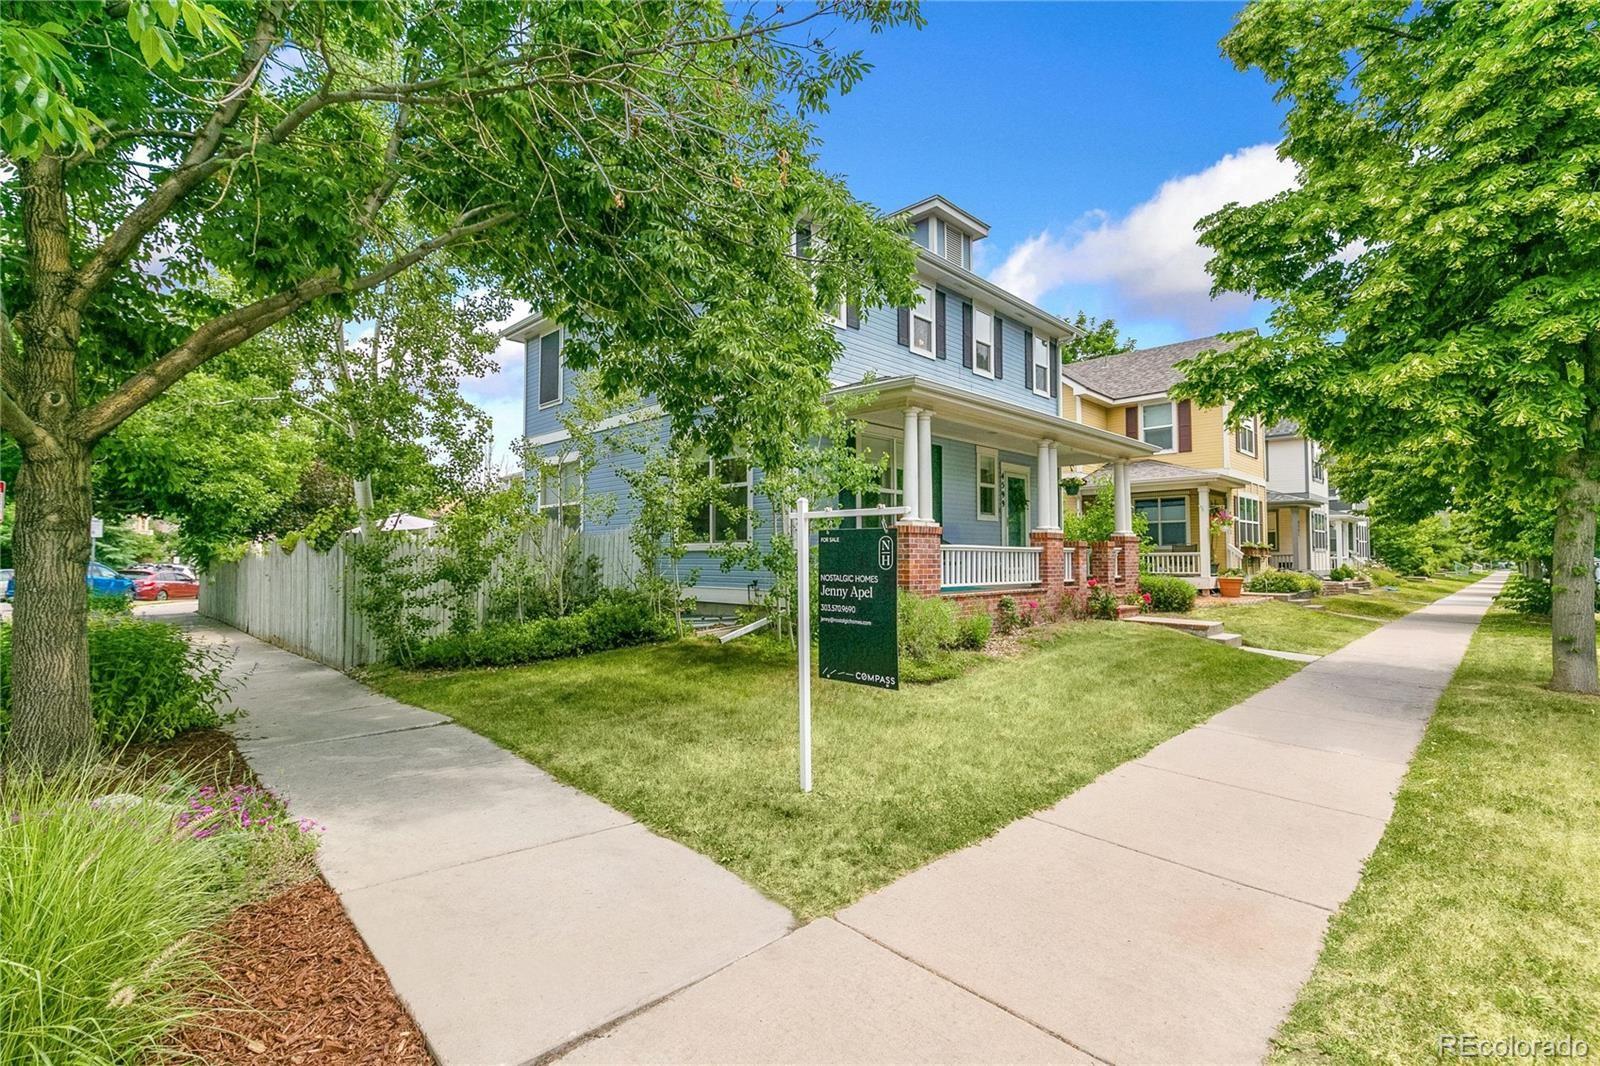 Photo of 4599 W 36th Avenue, Denver, CO 80212 (MLS # 8610132)